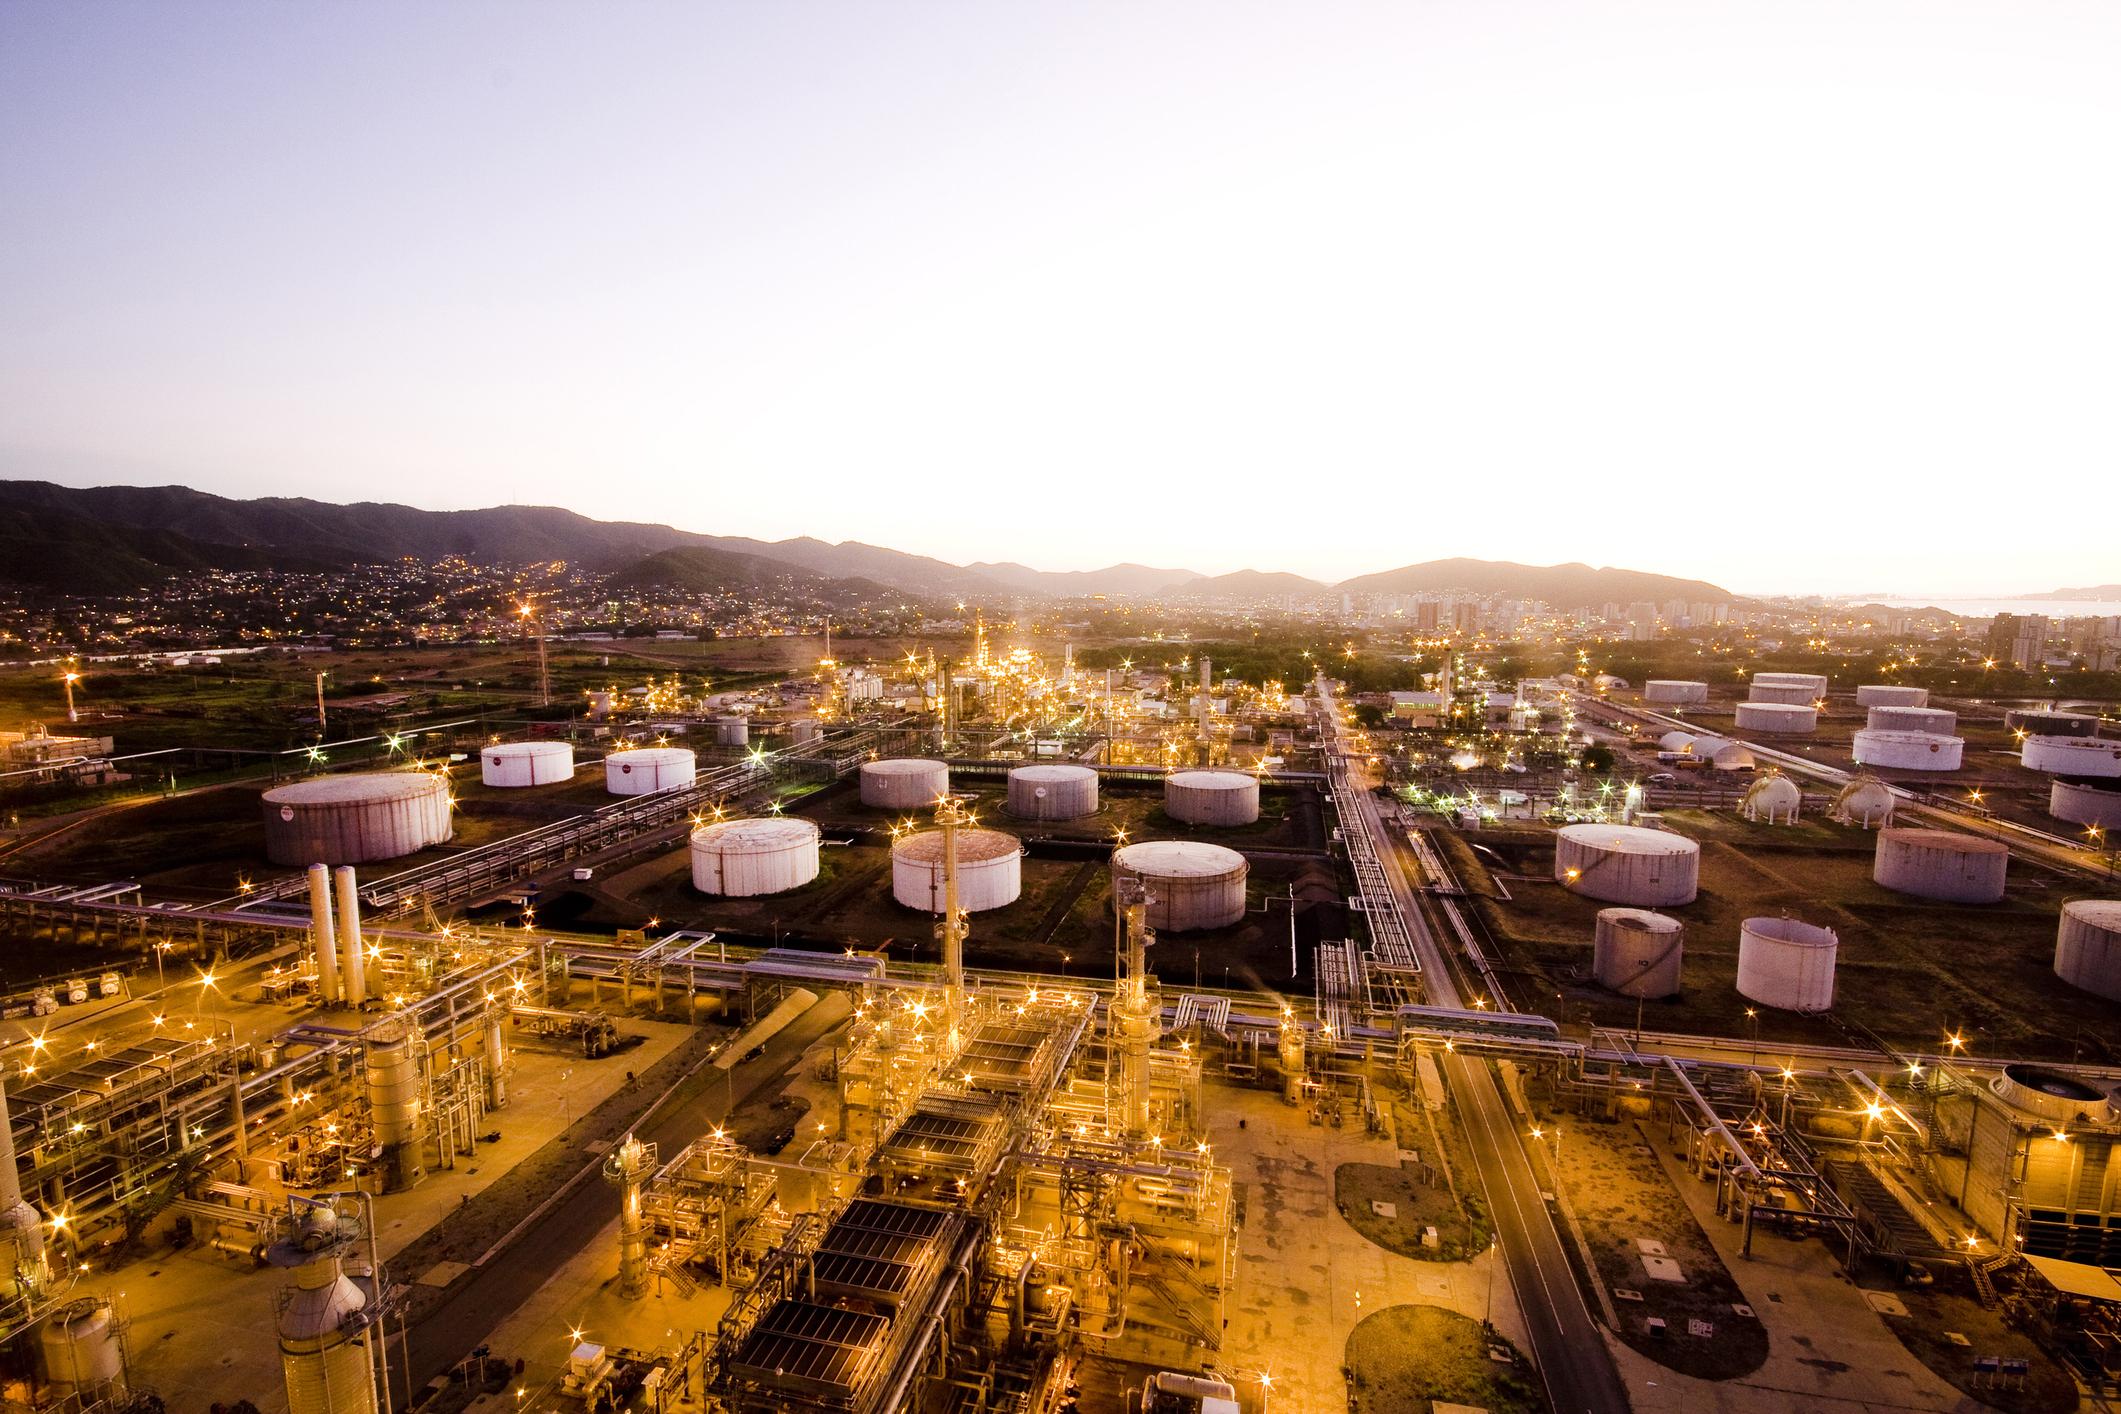 Oil refinery storage tanks